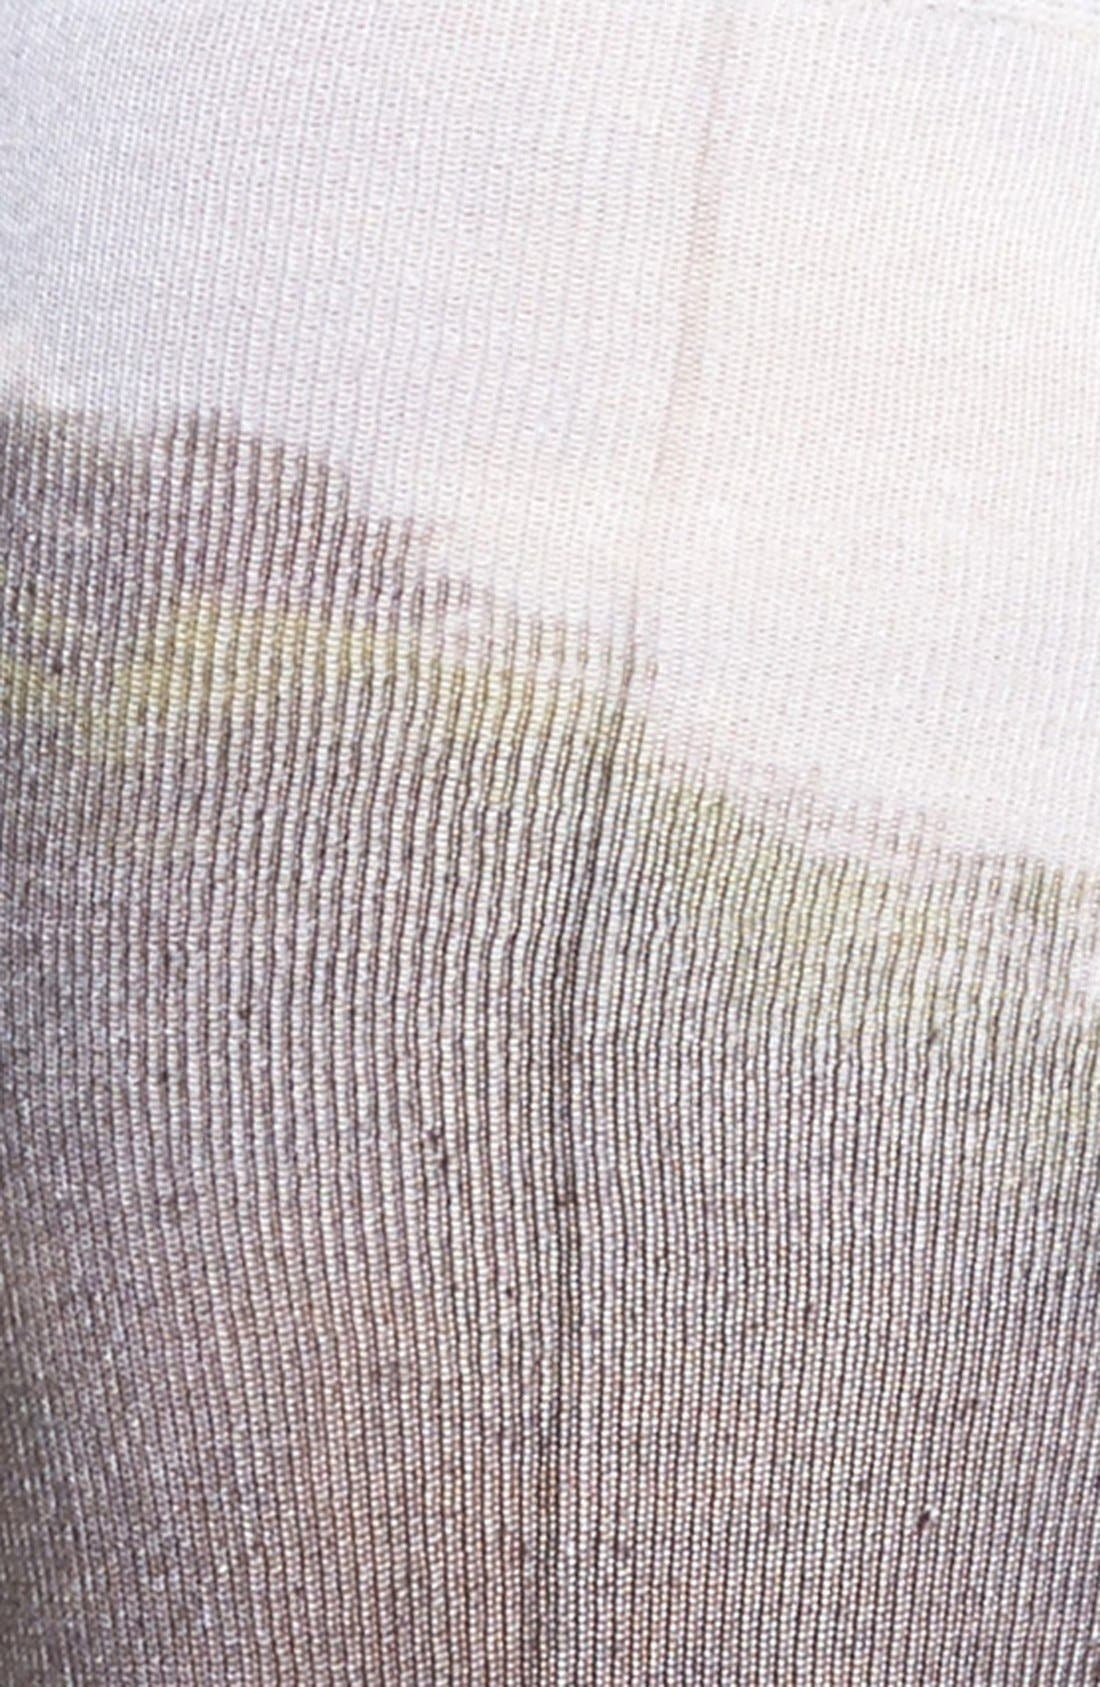 Alternate Image 2  - Stance Earth Vs. Cosmo Knee Socks